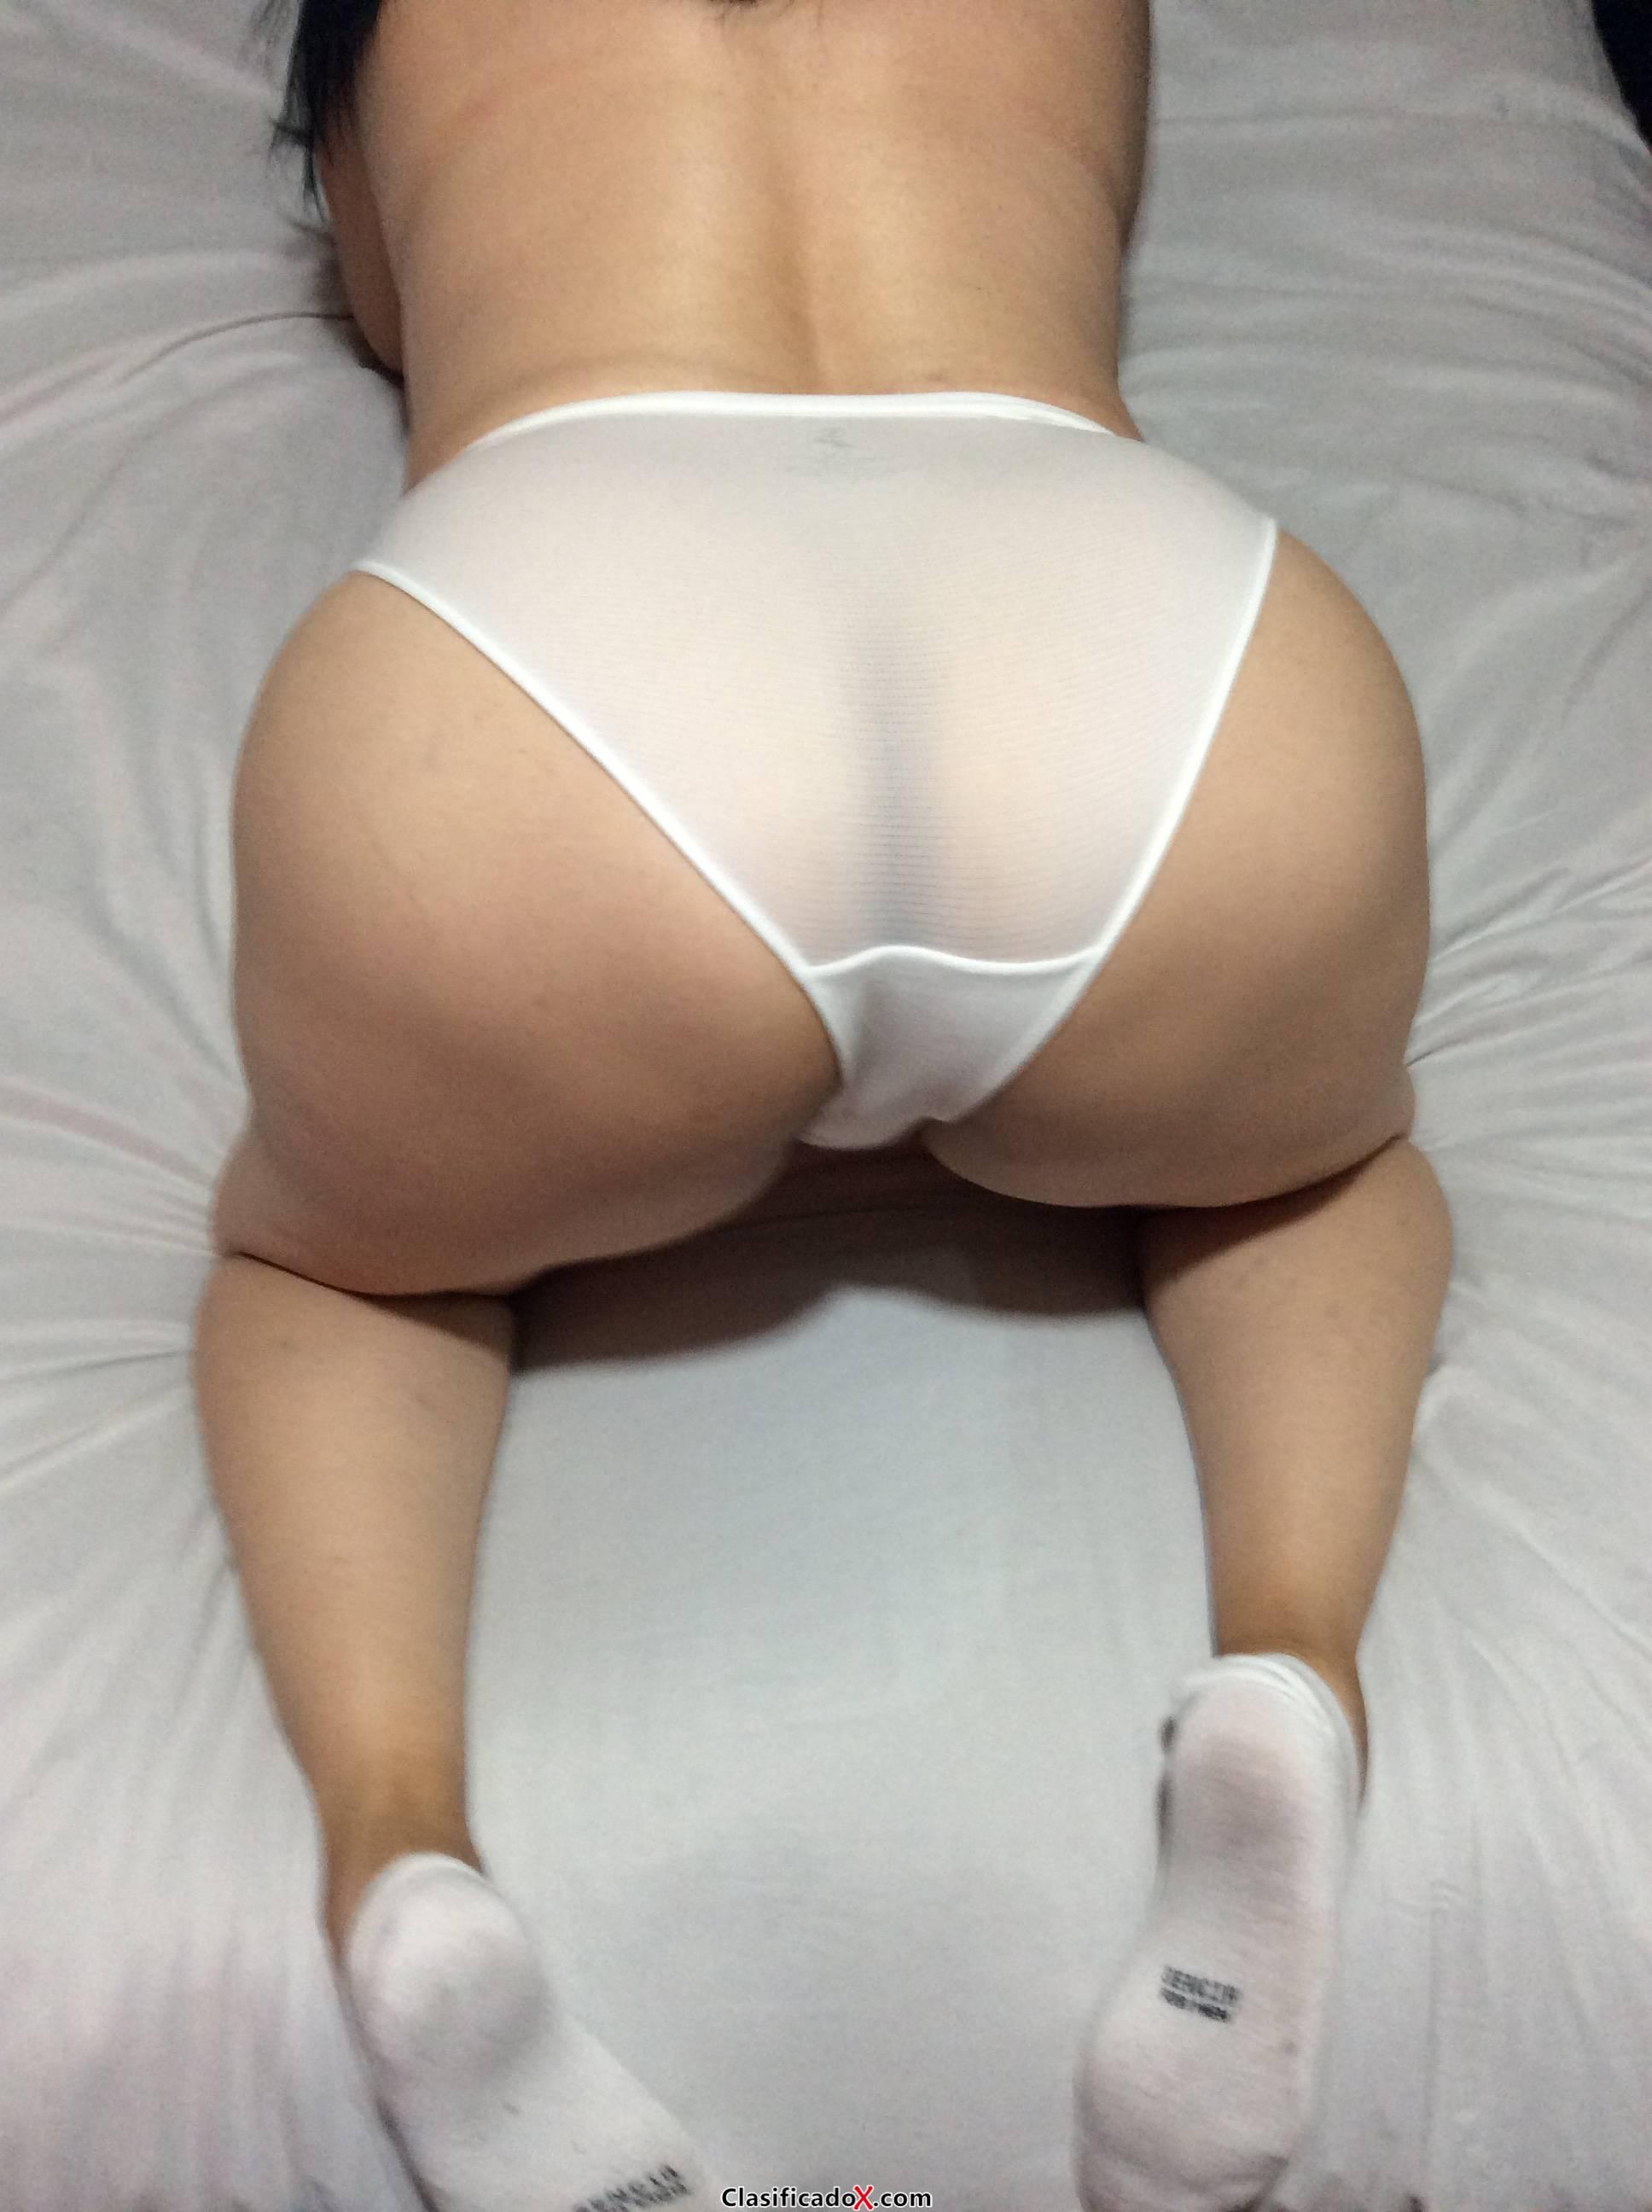 señora julia galano   real  madurita  con lugar   spa